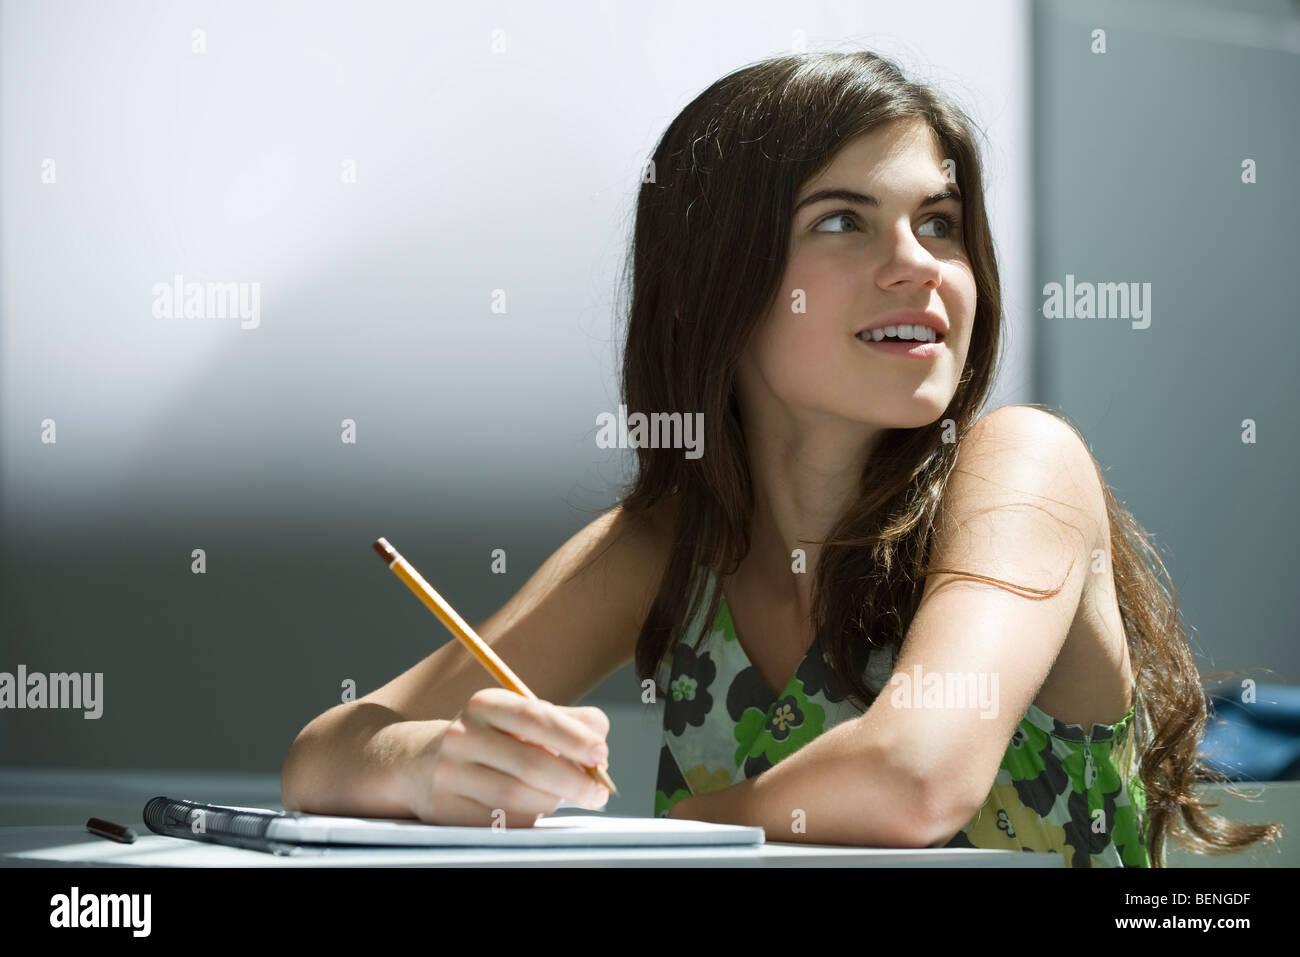 Teenage girl writing in notebook, dreamily looking away - Stock Image